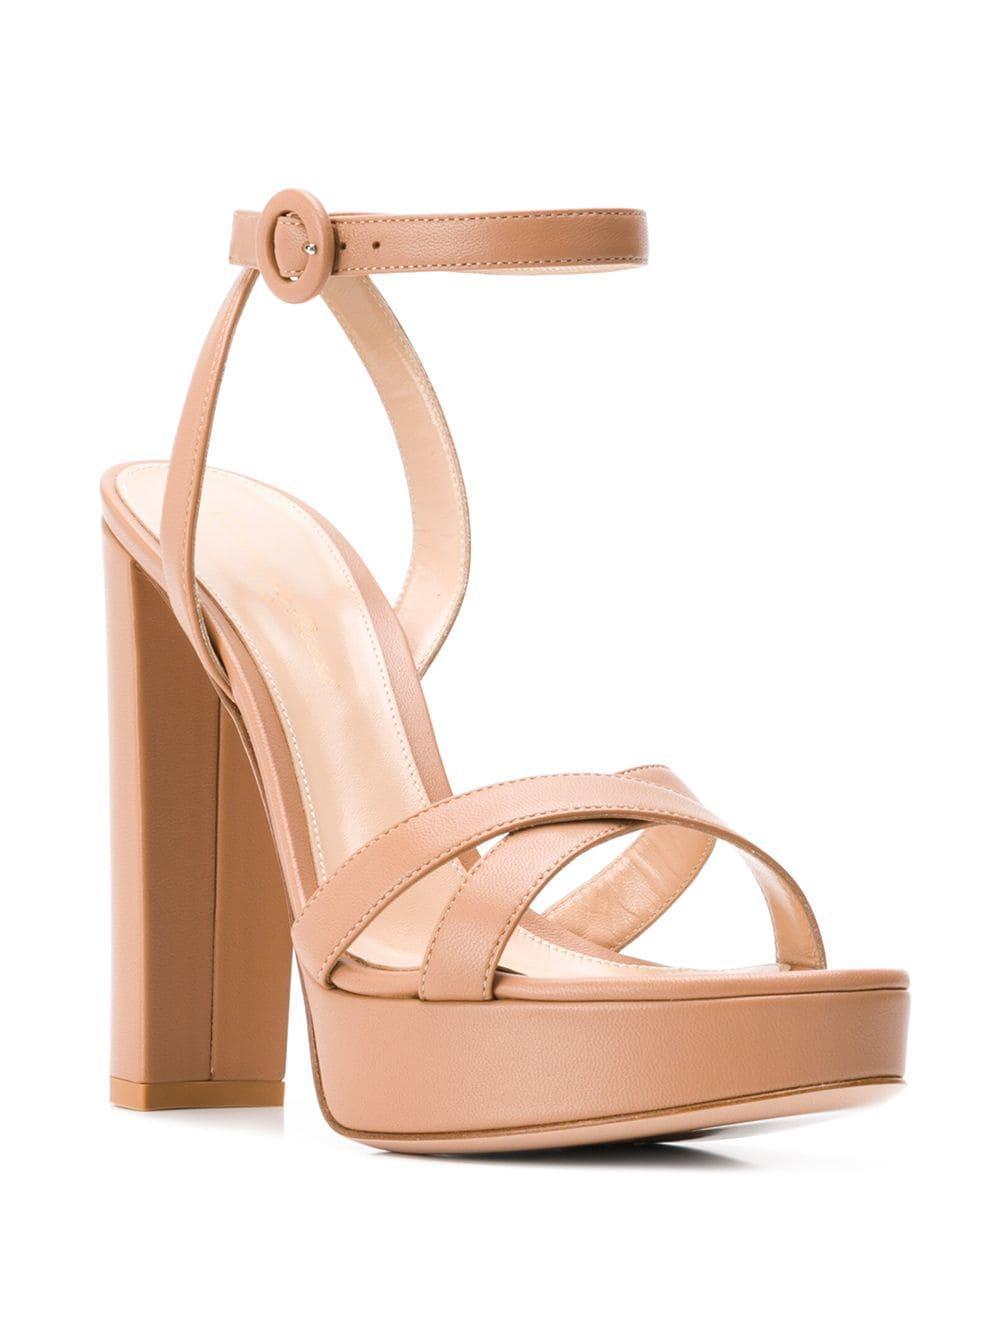 1dad8525042a Lyst - Gianvito Rossi Poppy Platform Sandals - Save 3%